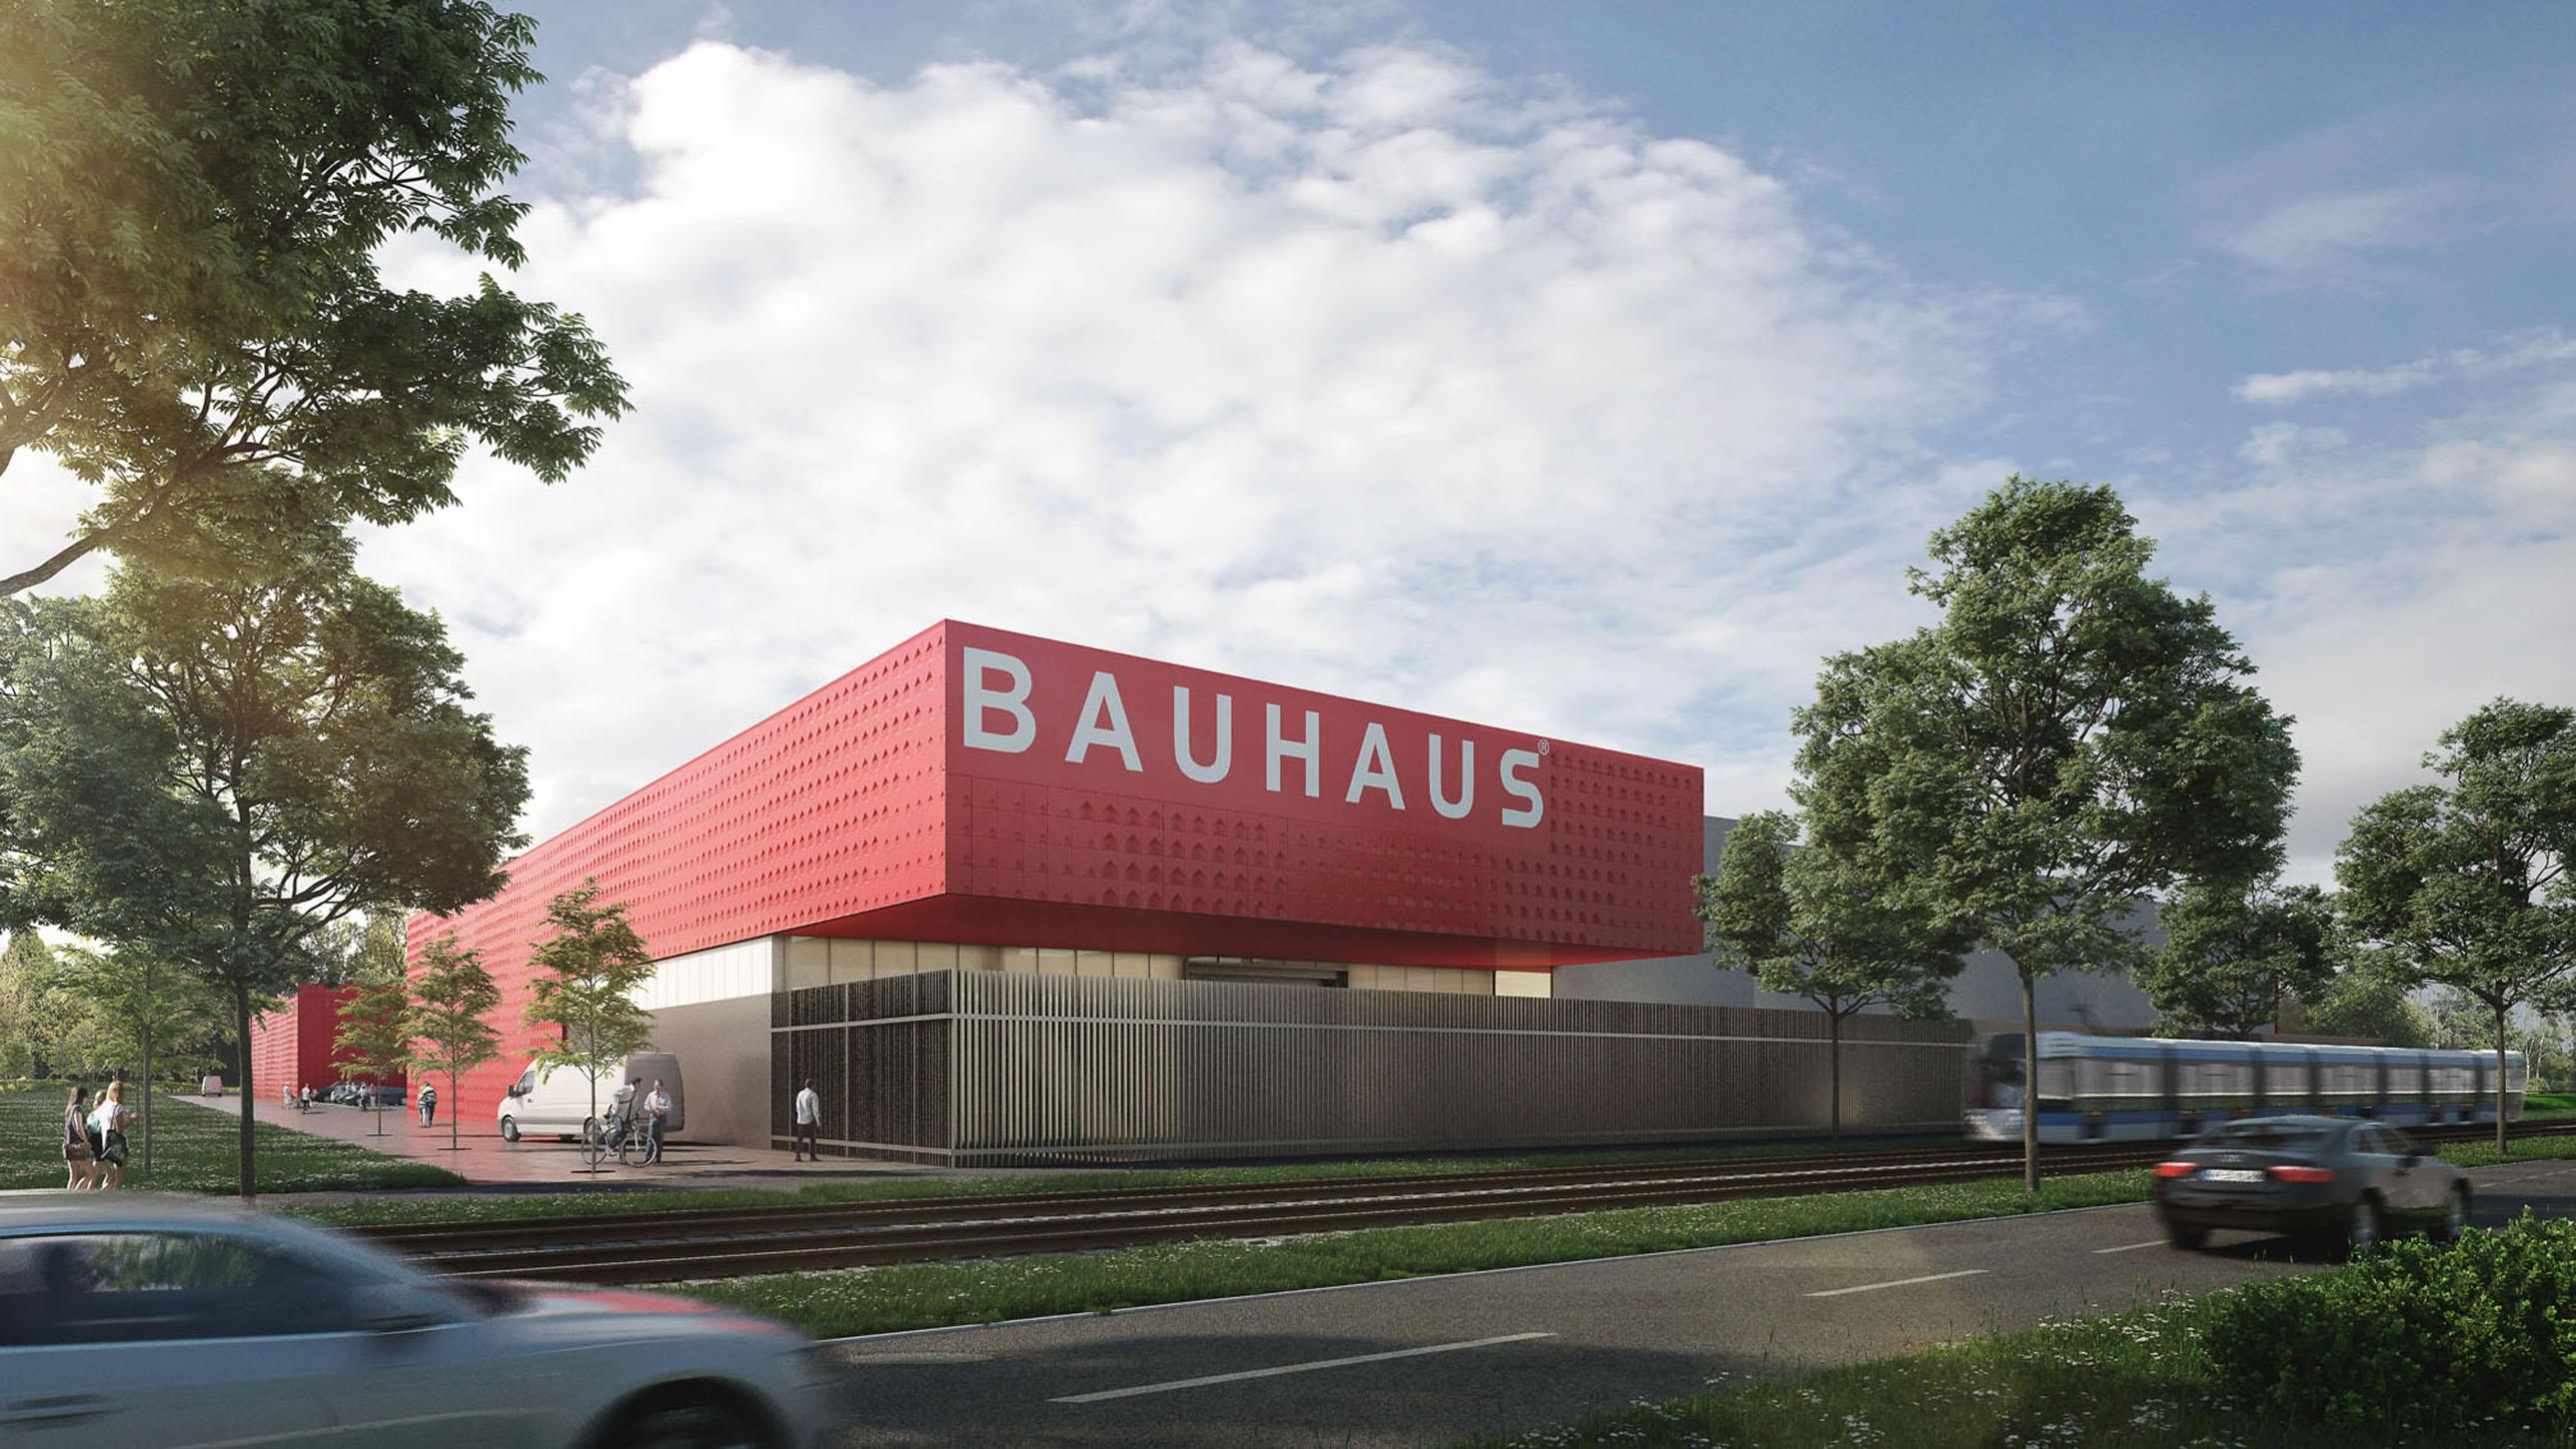 Bauhaus Parkhaus Mannheim